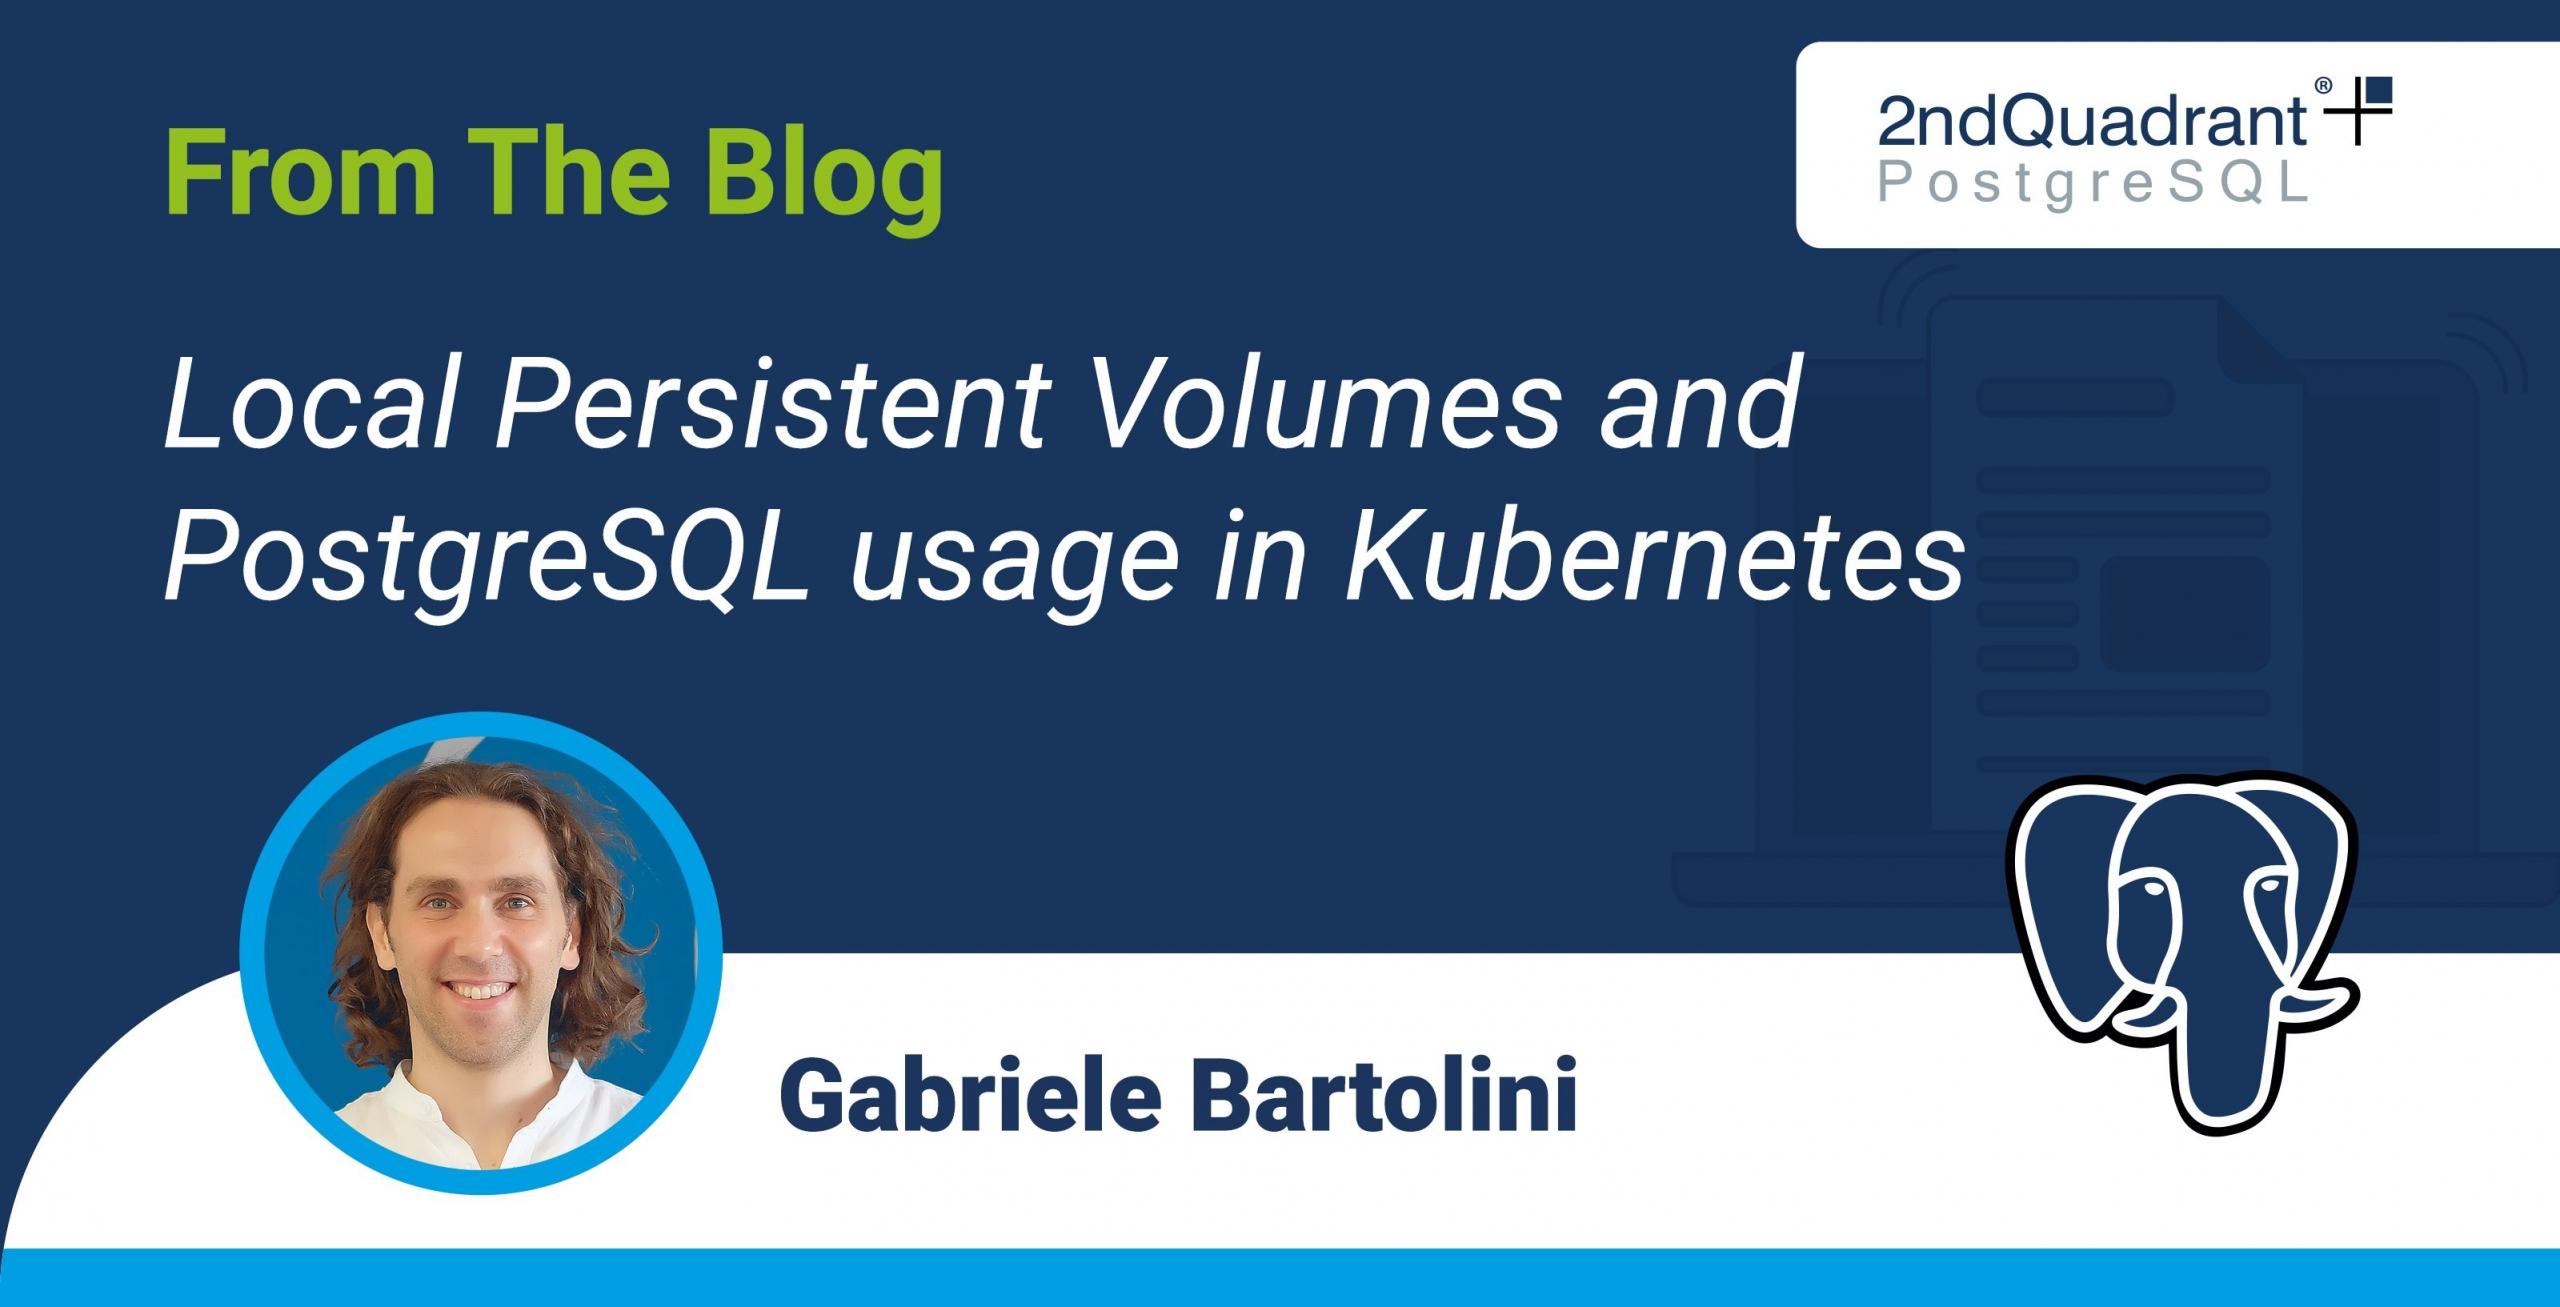 Local Persistent Volumes and PostgreSQL usage in Kubernetes